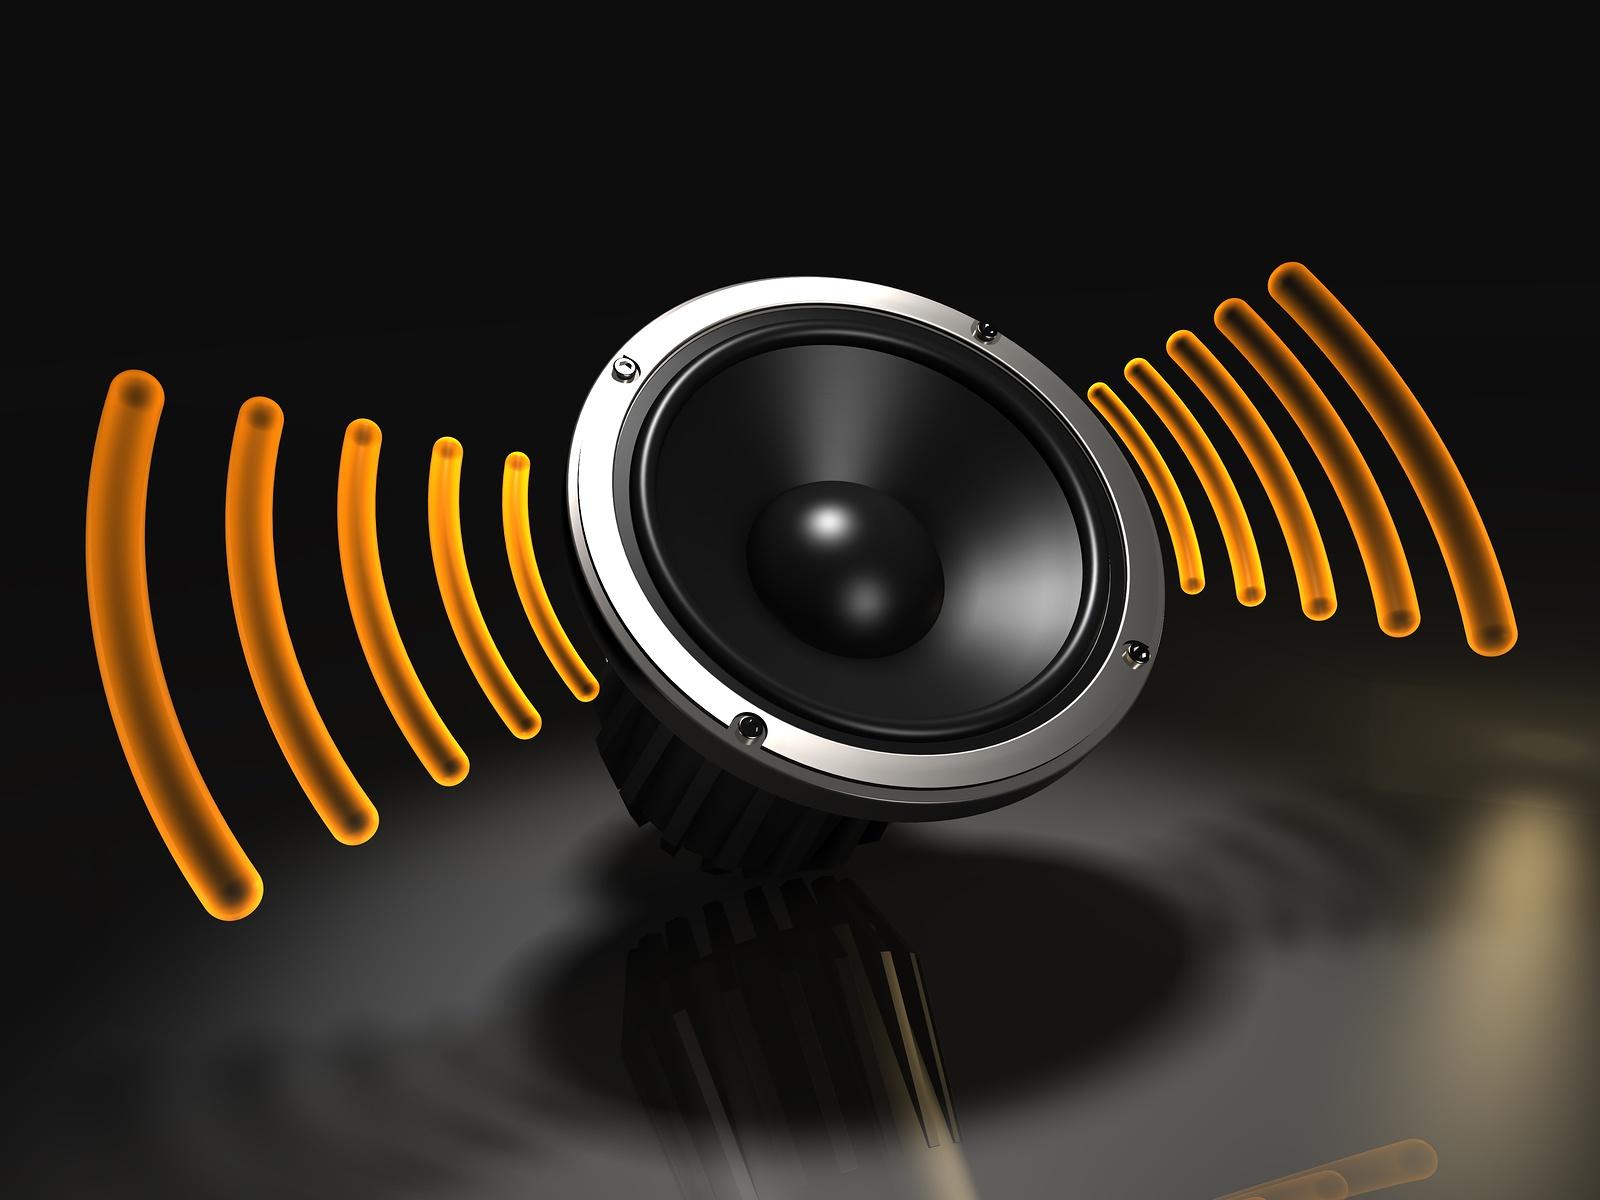 Top Wallpaper Music Soundwave - 1fTEQF  You Should Have_151356.jpg